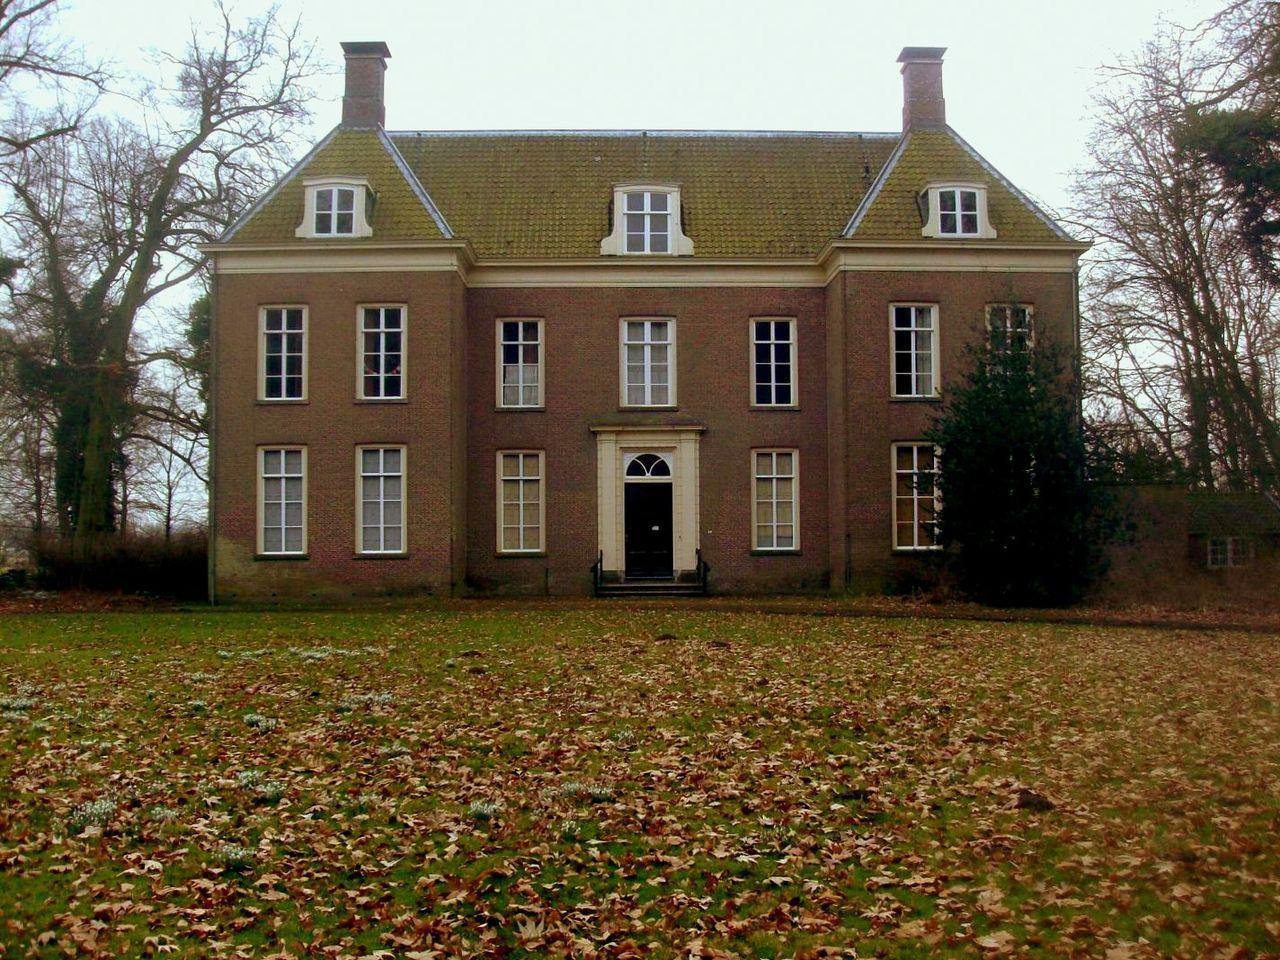 Amelisweerd - Not yet visited